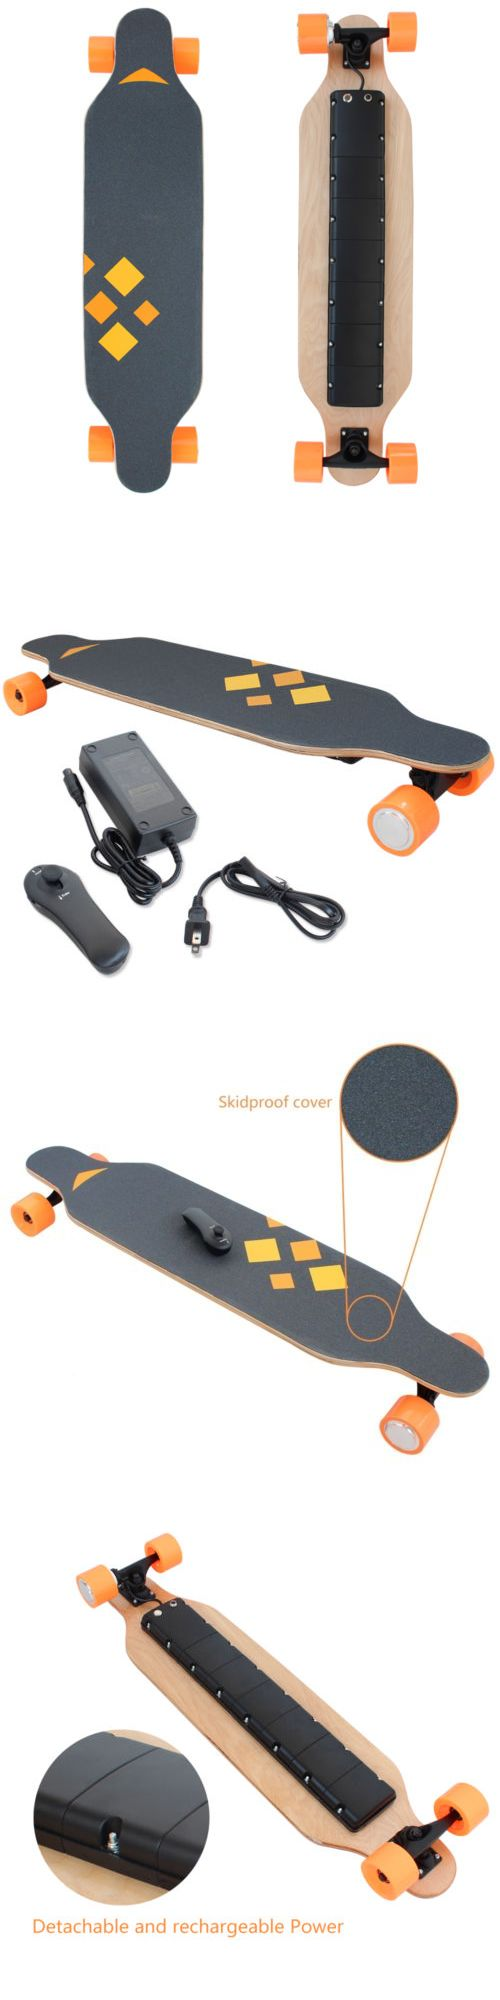 Other Outdoor Sports 159048: Wireless Remote Control 4 Wheels Electric Skateboard Longboard Skate Board -> BUY IT NOW ONLY: $189.99 on eBay!